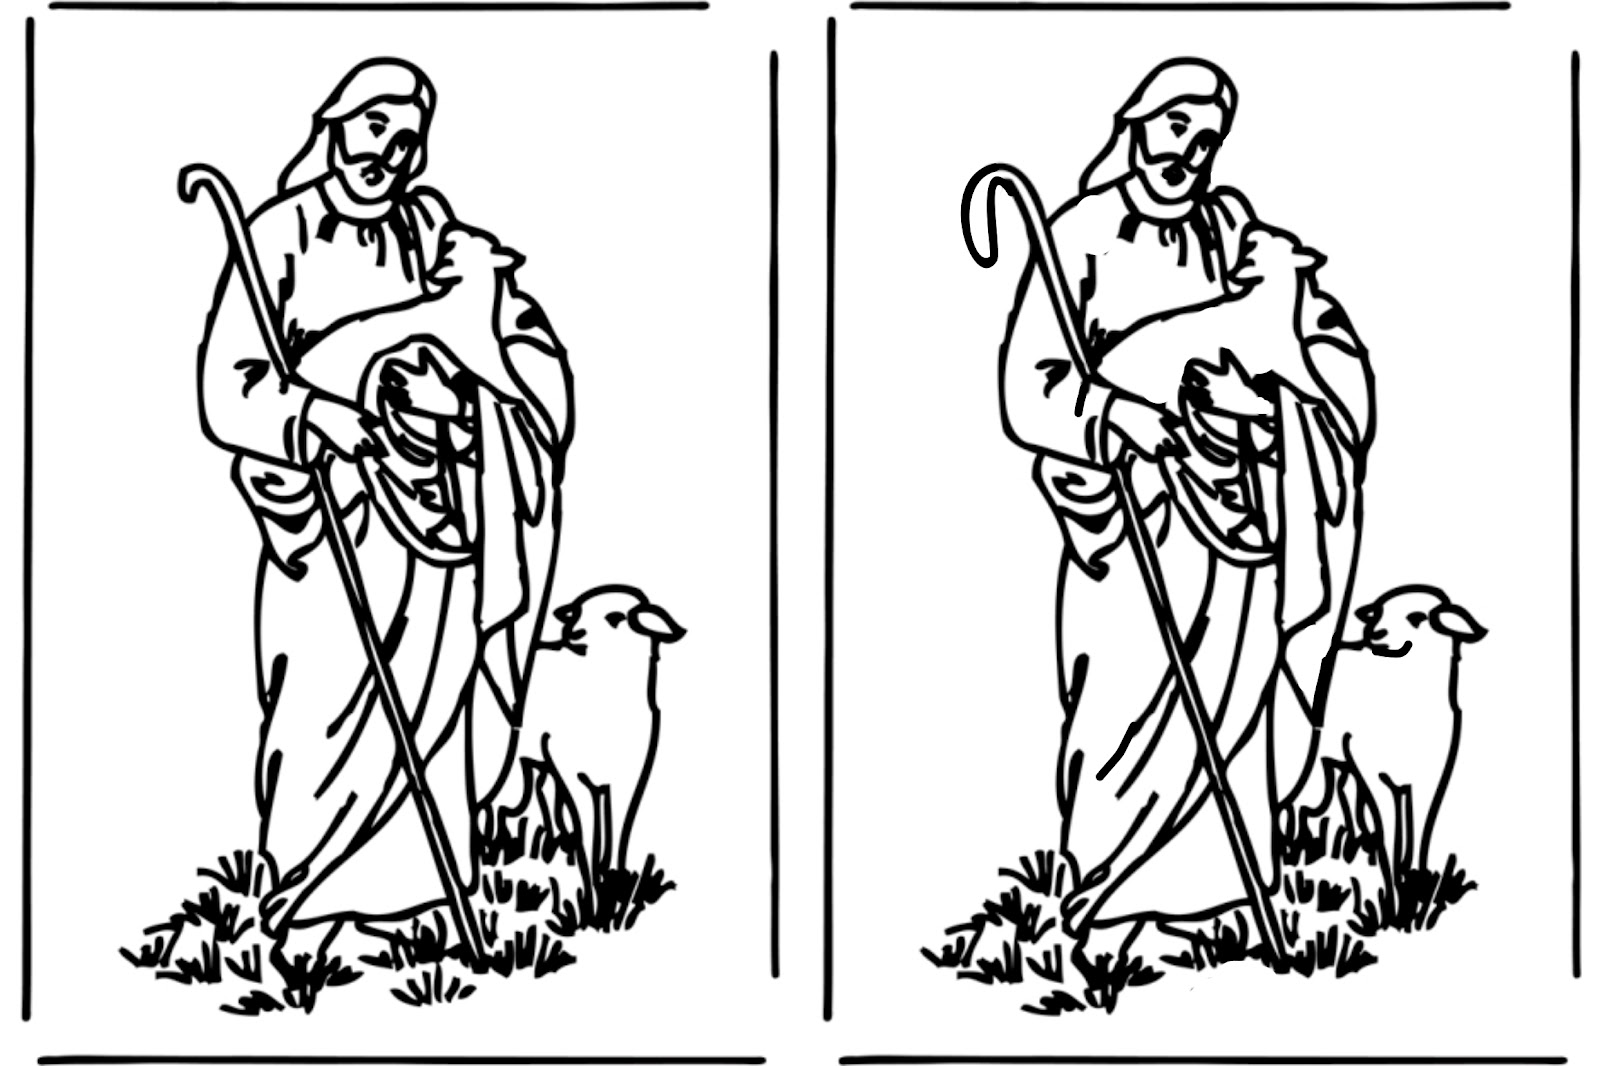 dibujos para colorear e imprimir cristianos